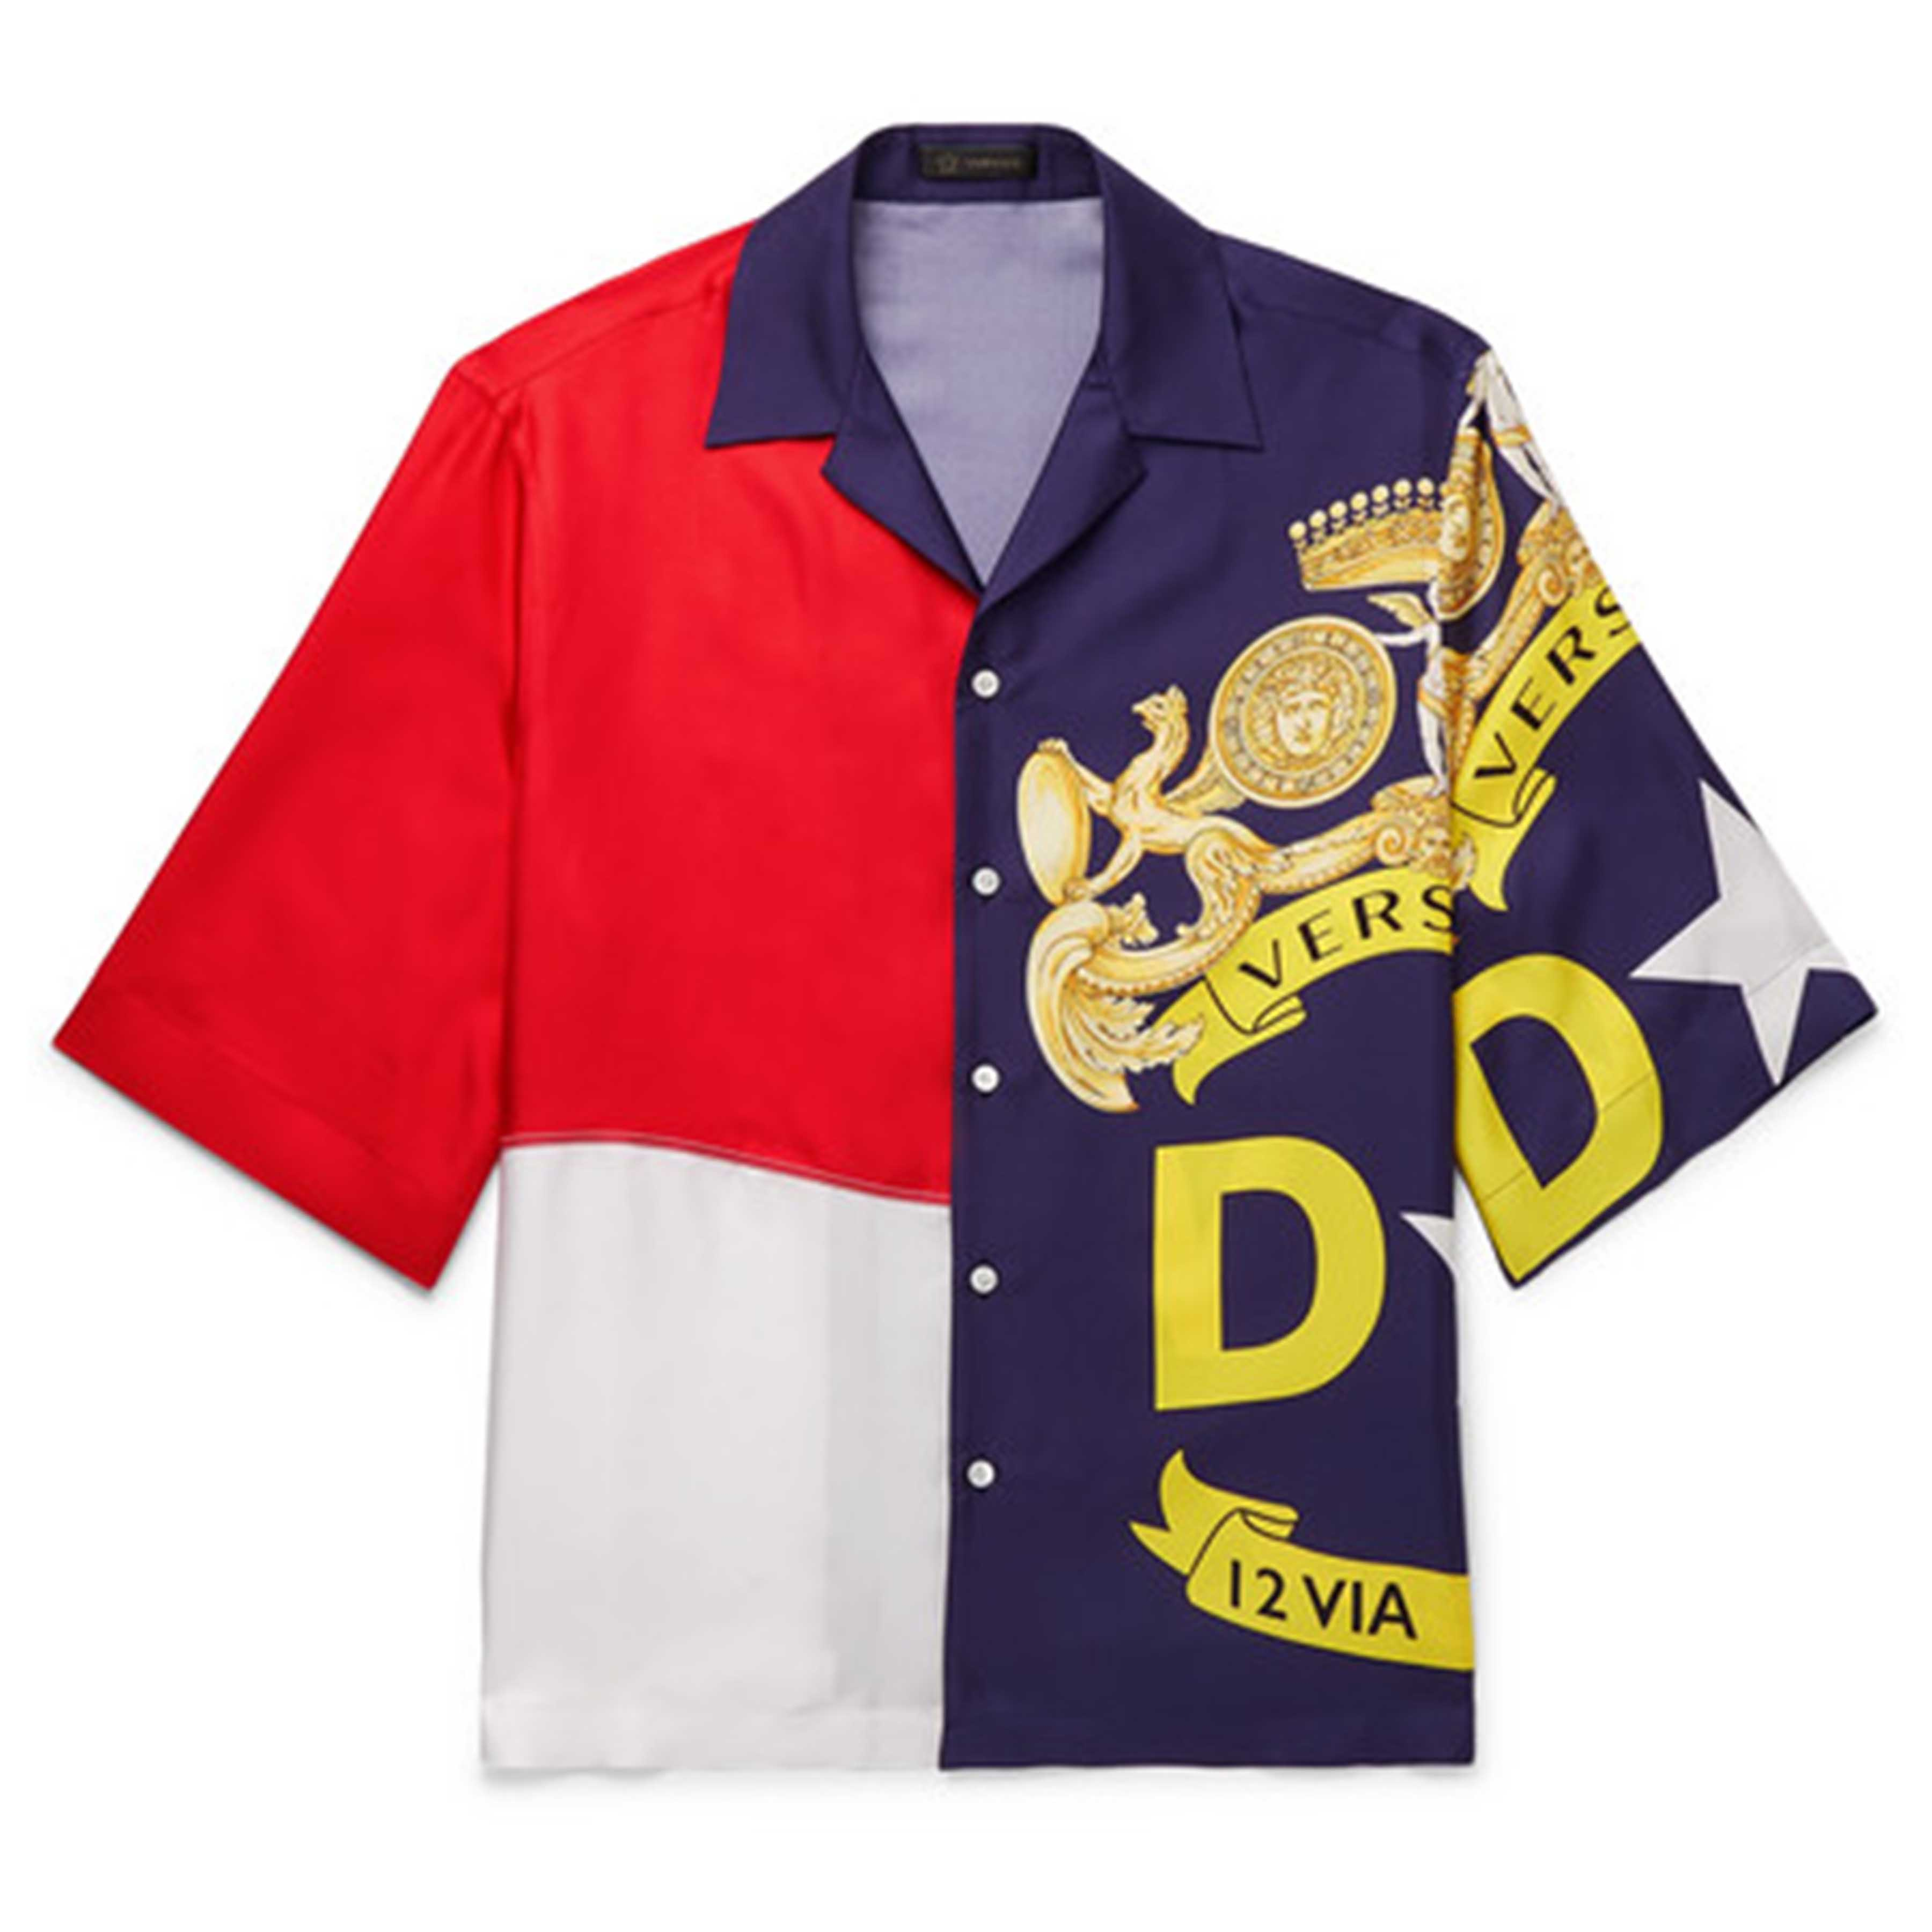 SS19 Printed Shirts: VERSACE